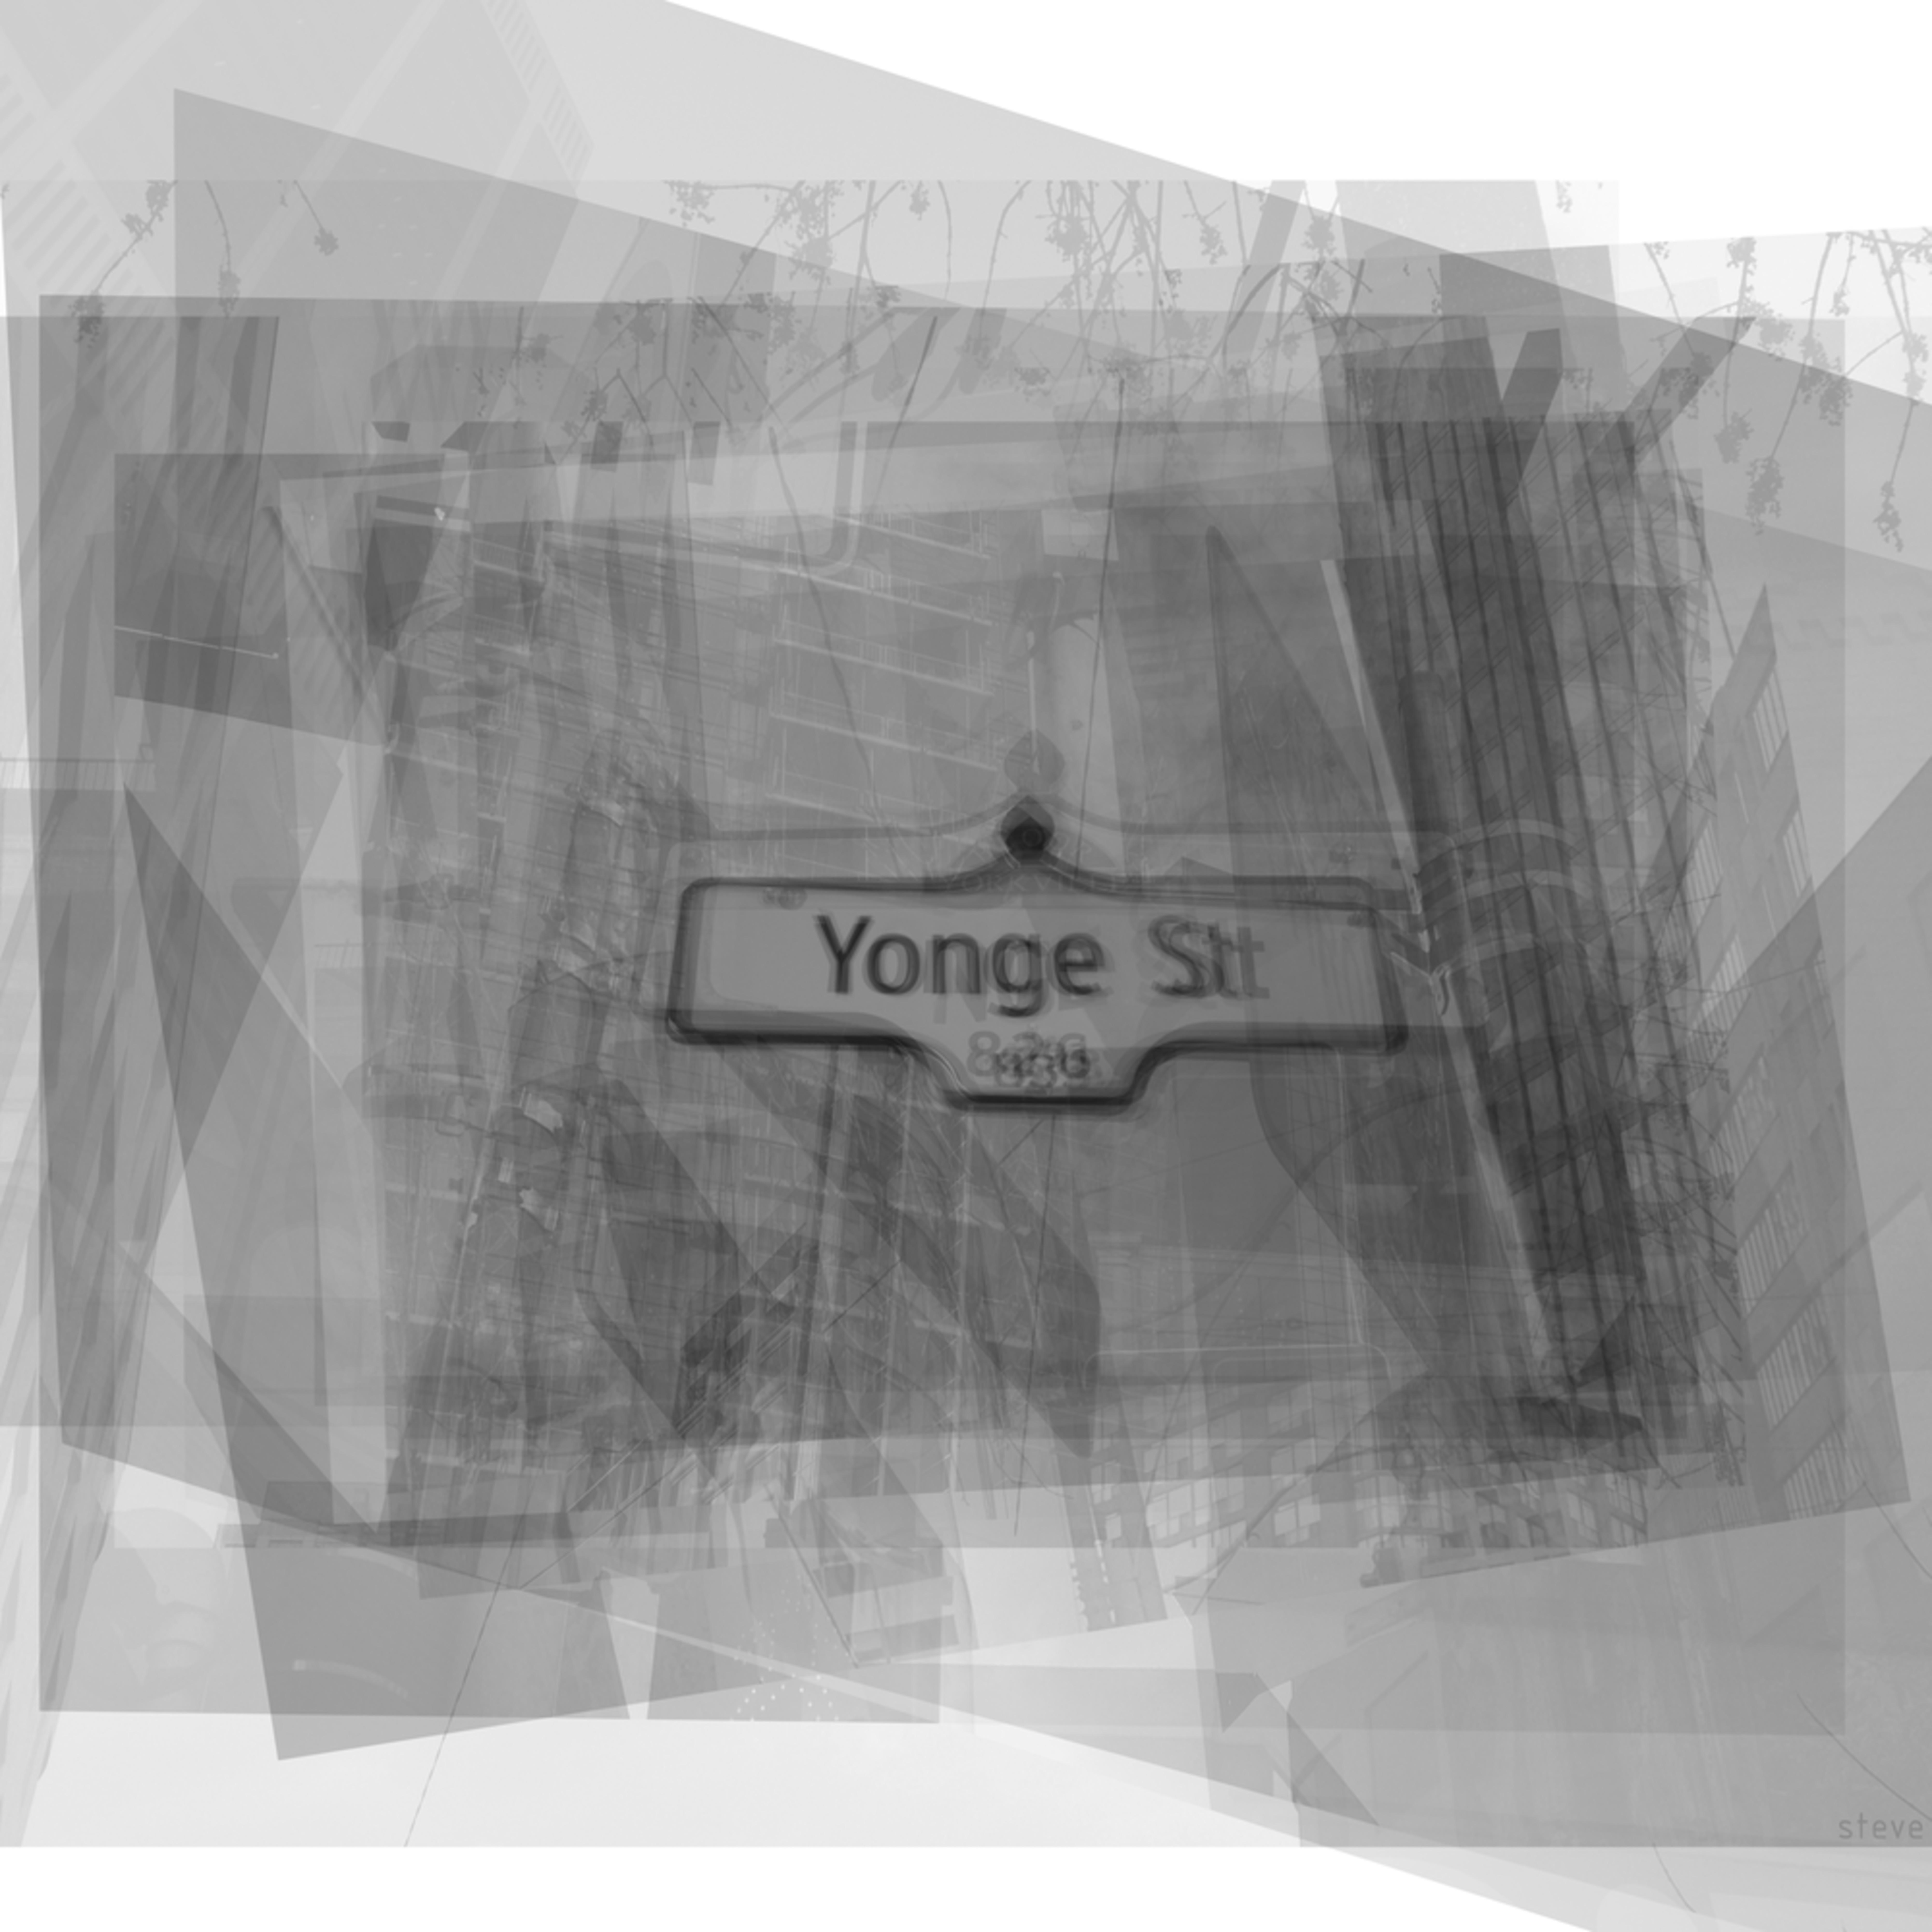 Yonge street sign b1alpr